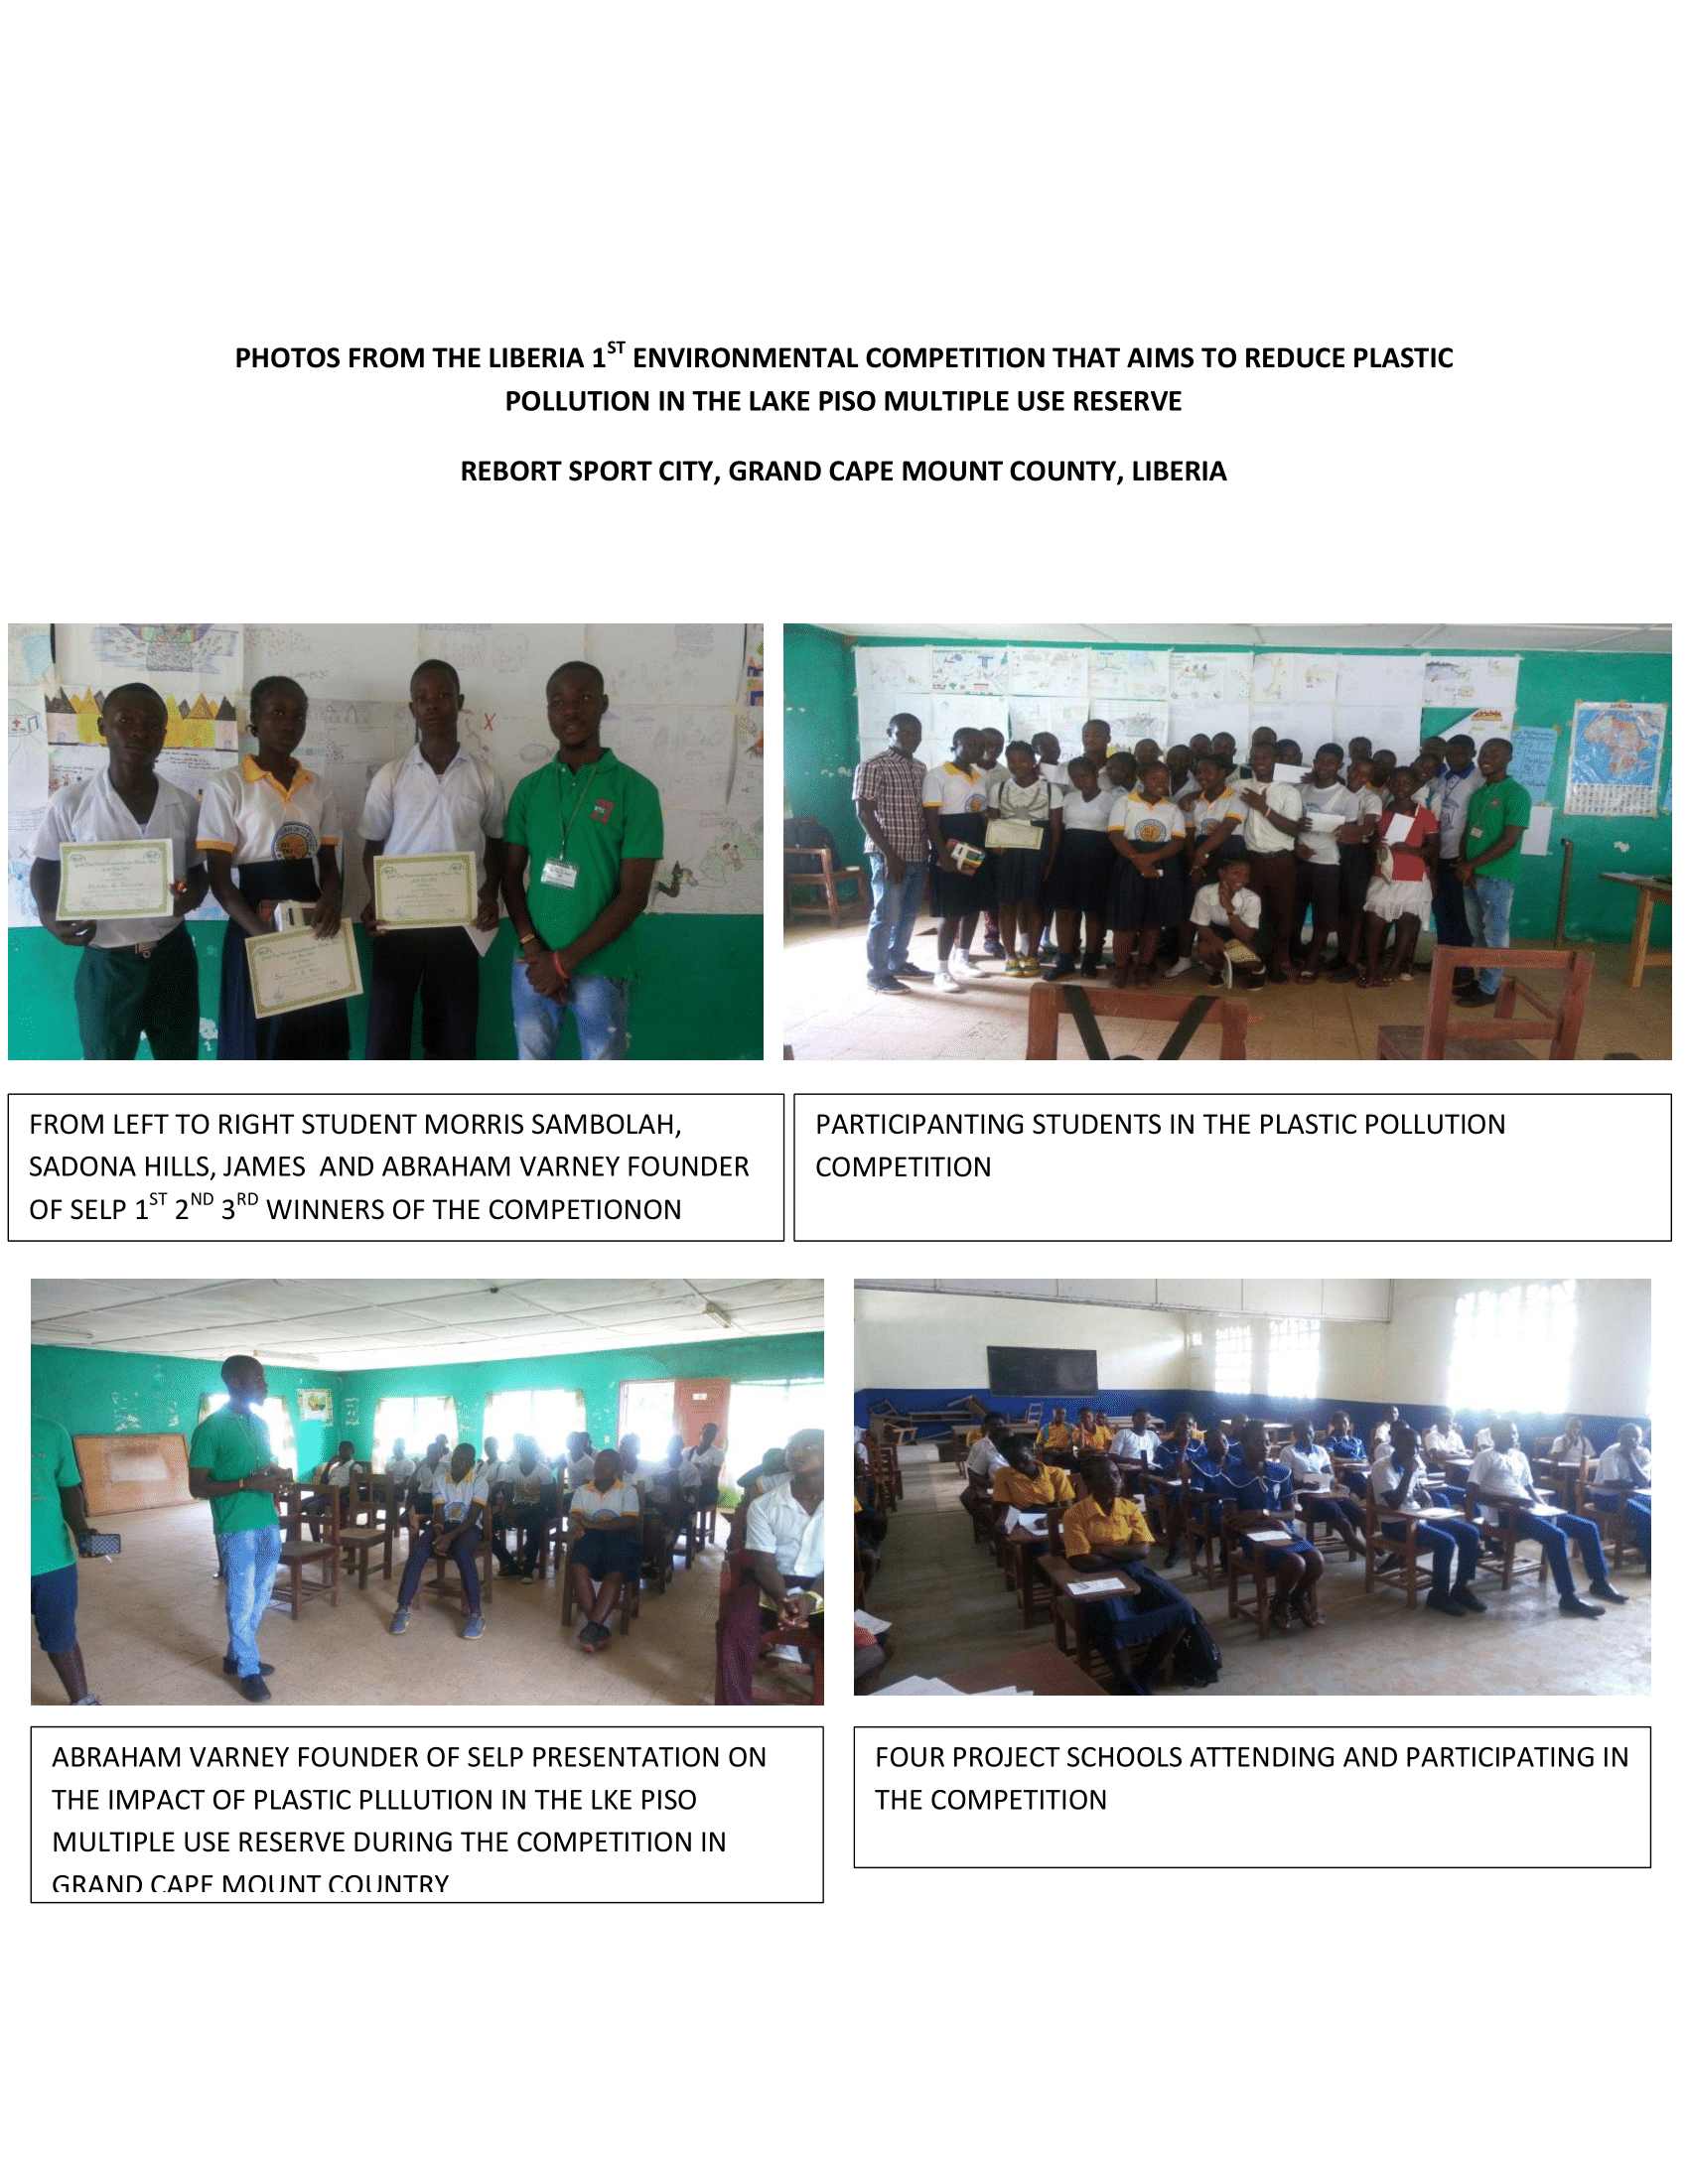 Abraham Varney-Official Launch Student Environmental Leadership Program-in-Liberia - Abraham Varney-2.png